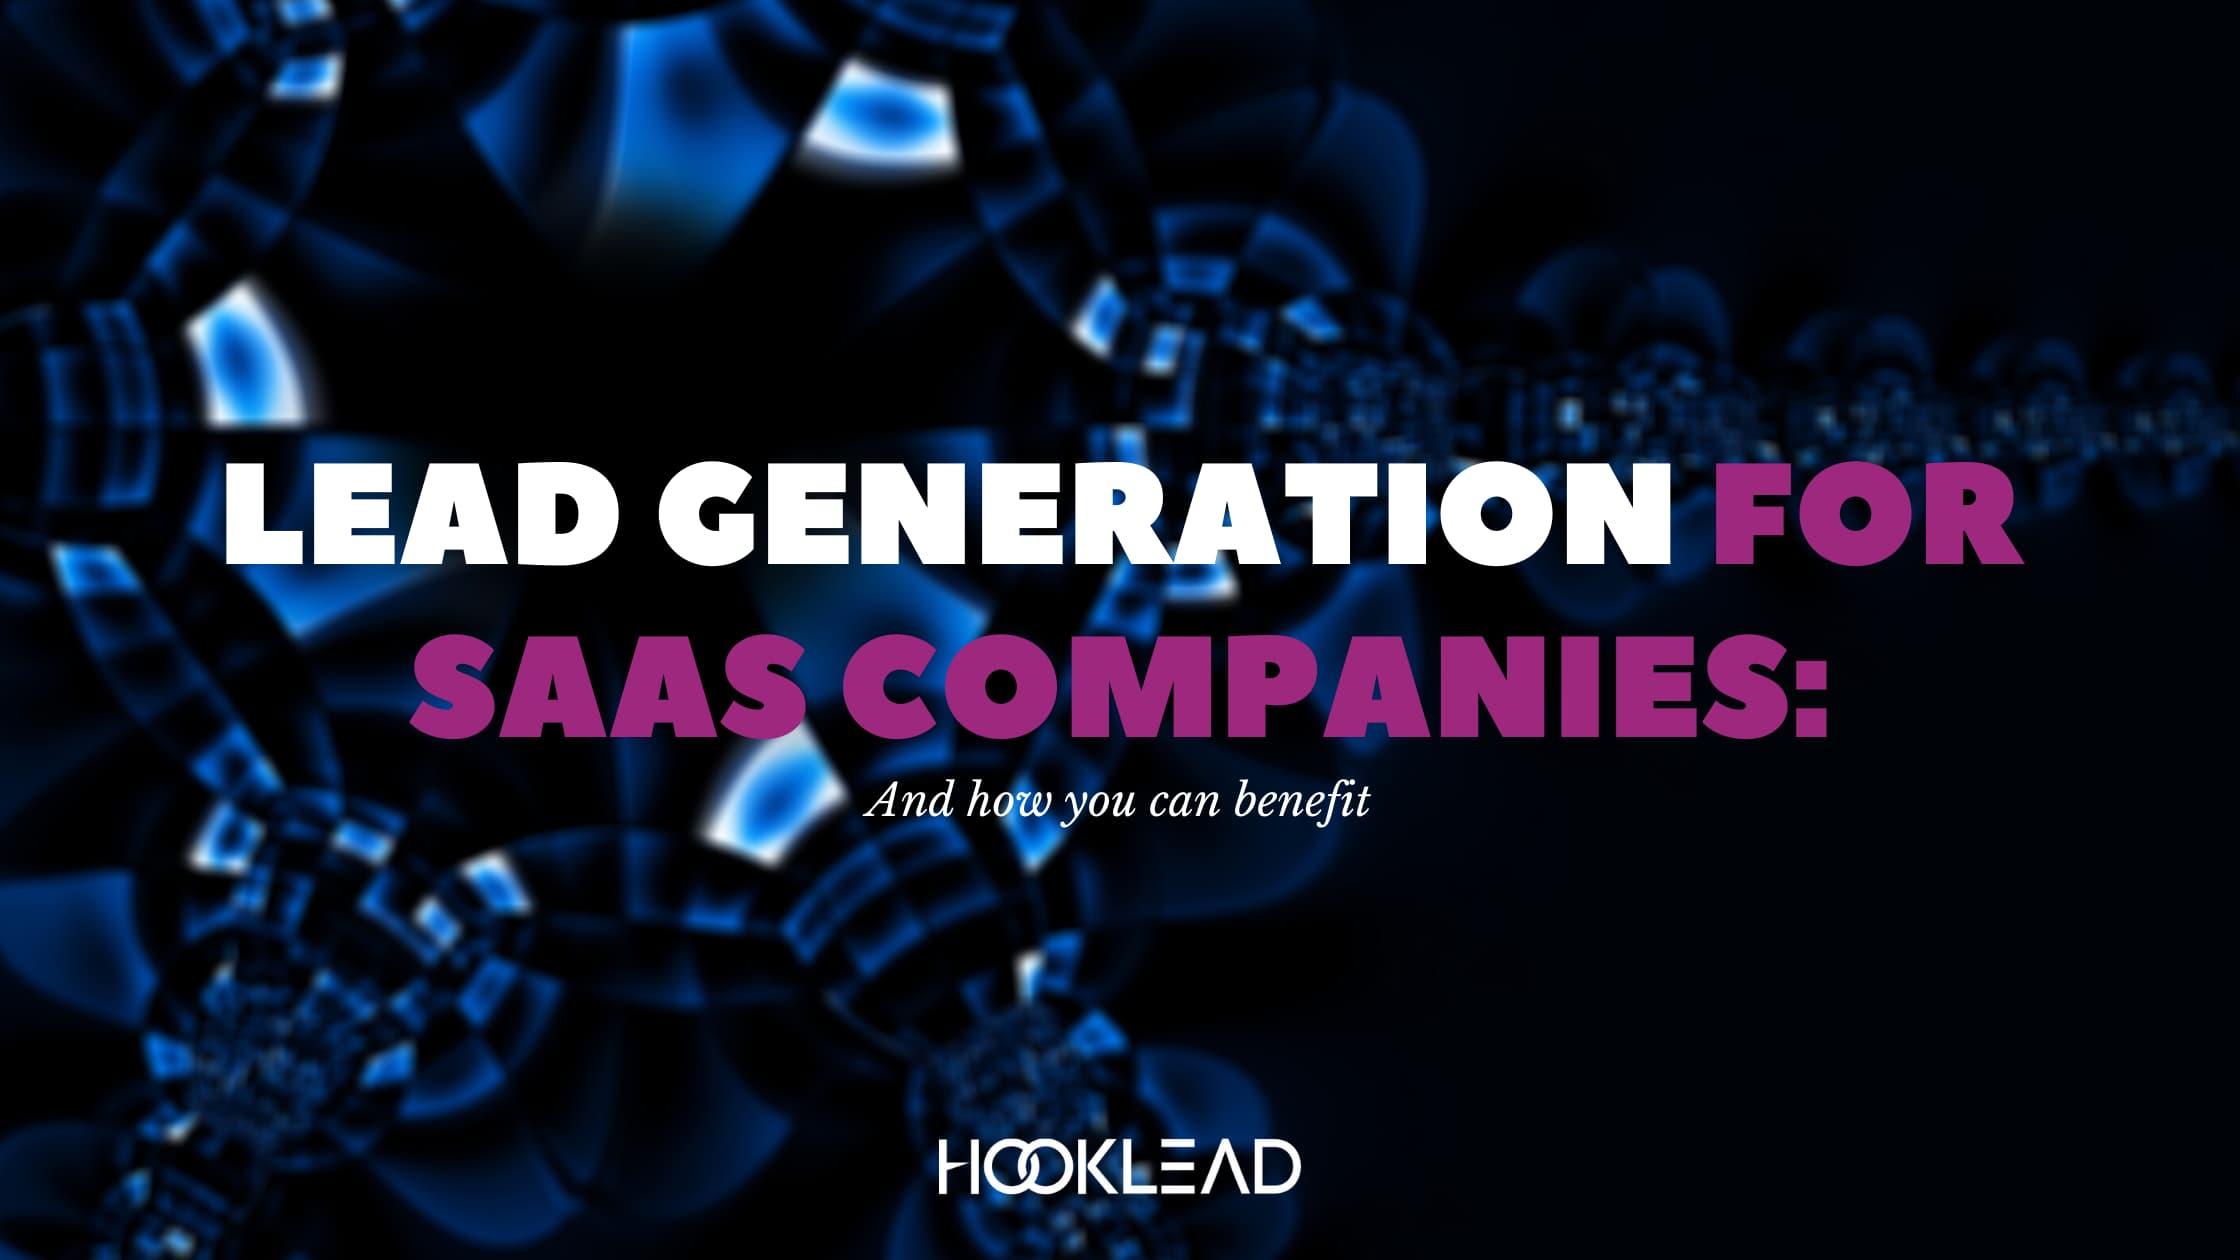 Lead Generation for SaaS Companies